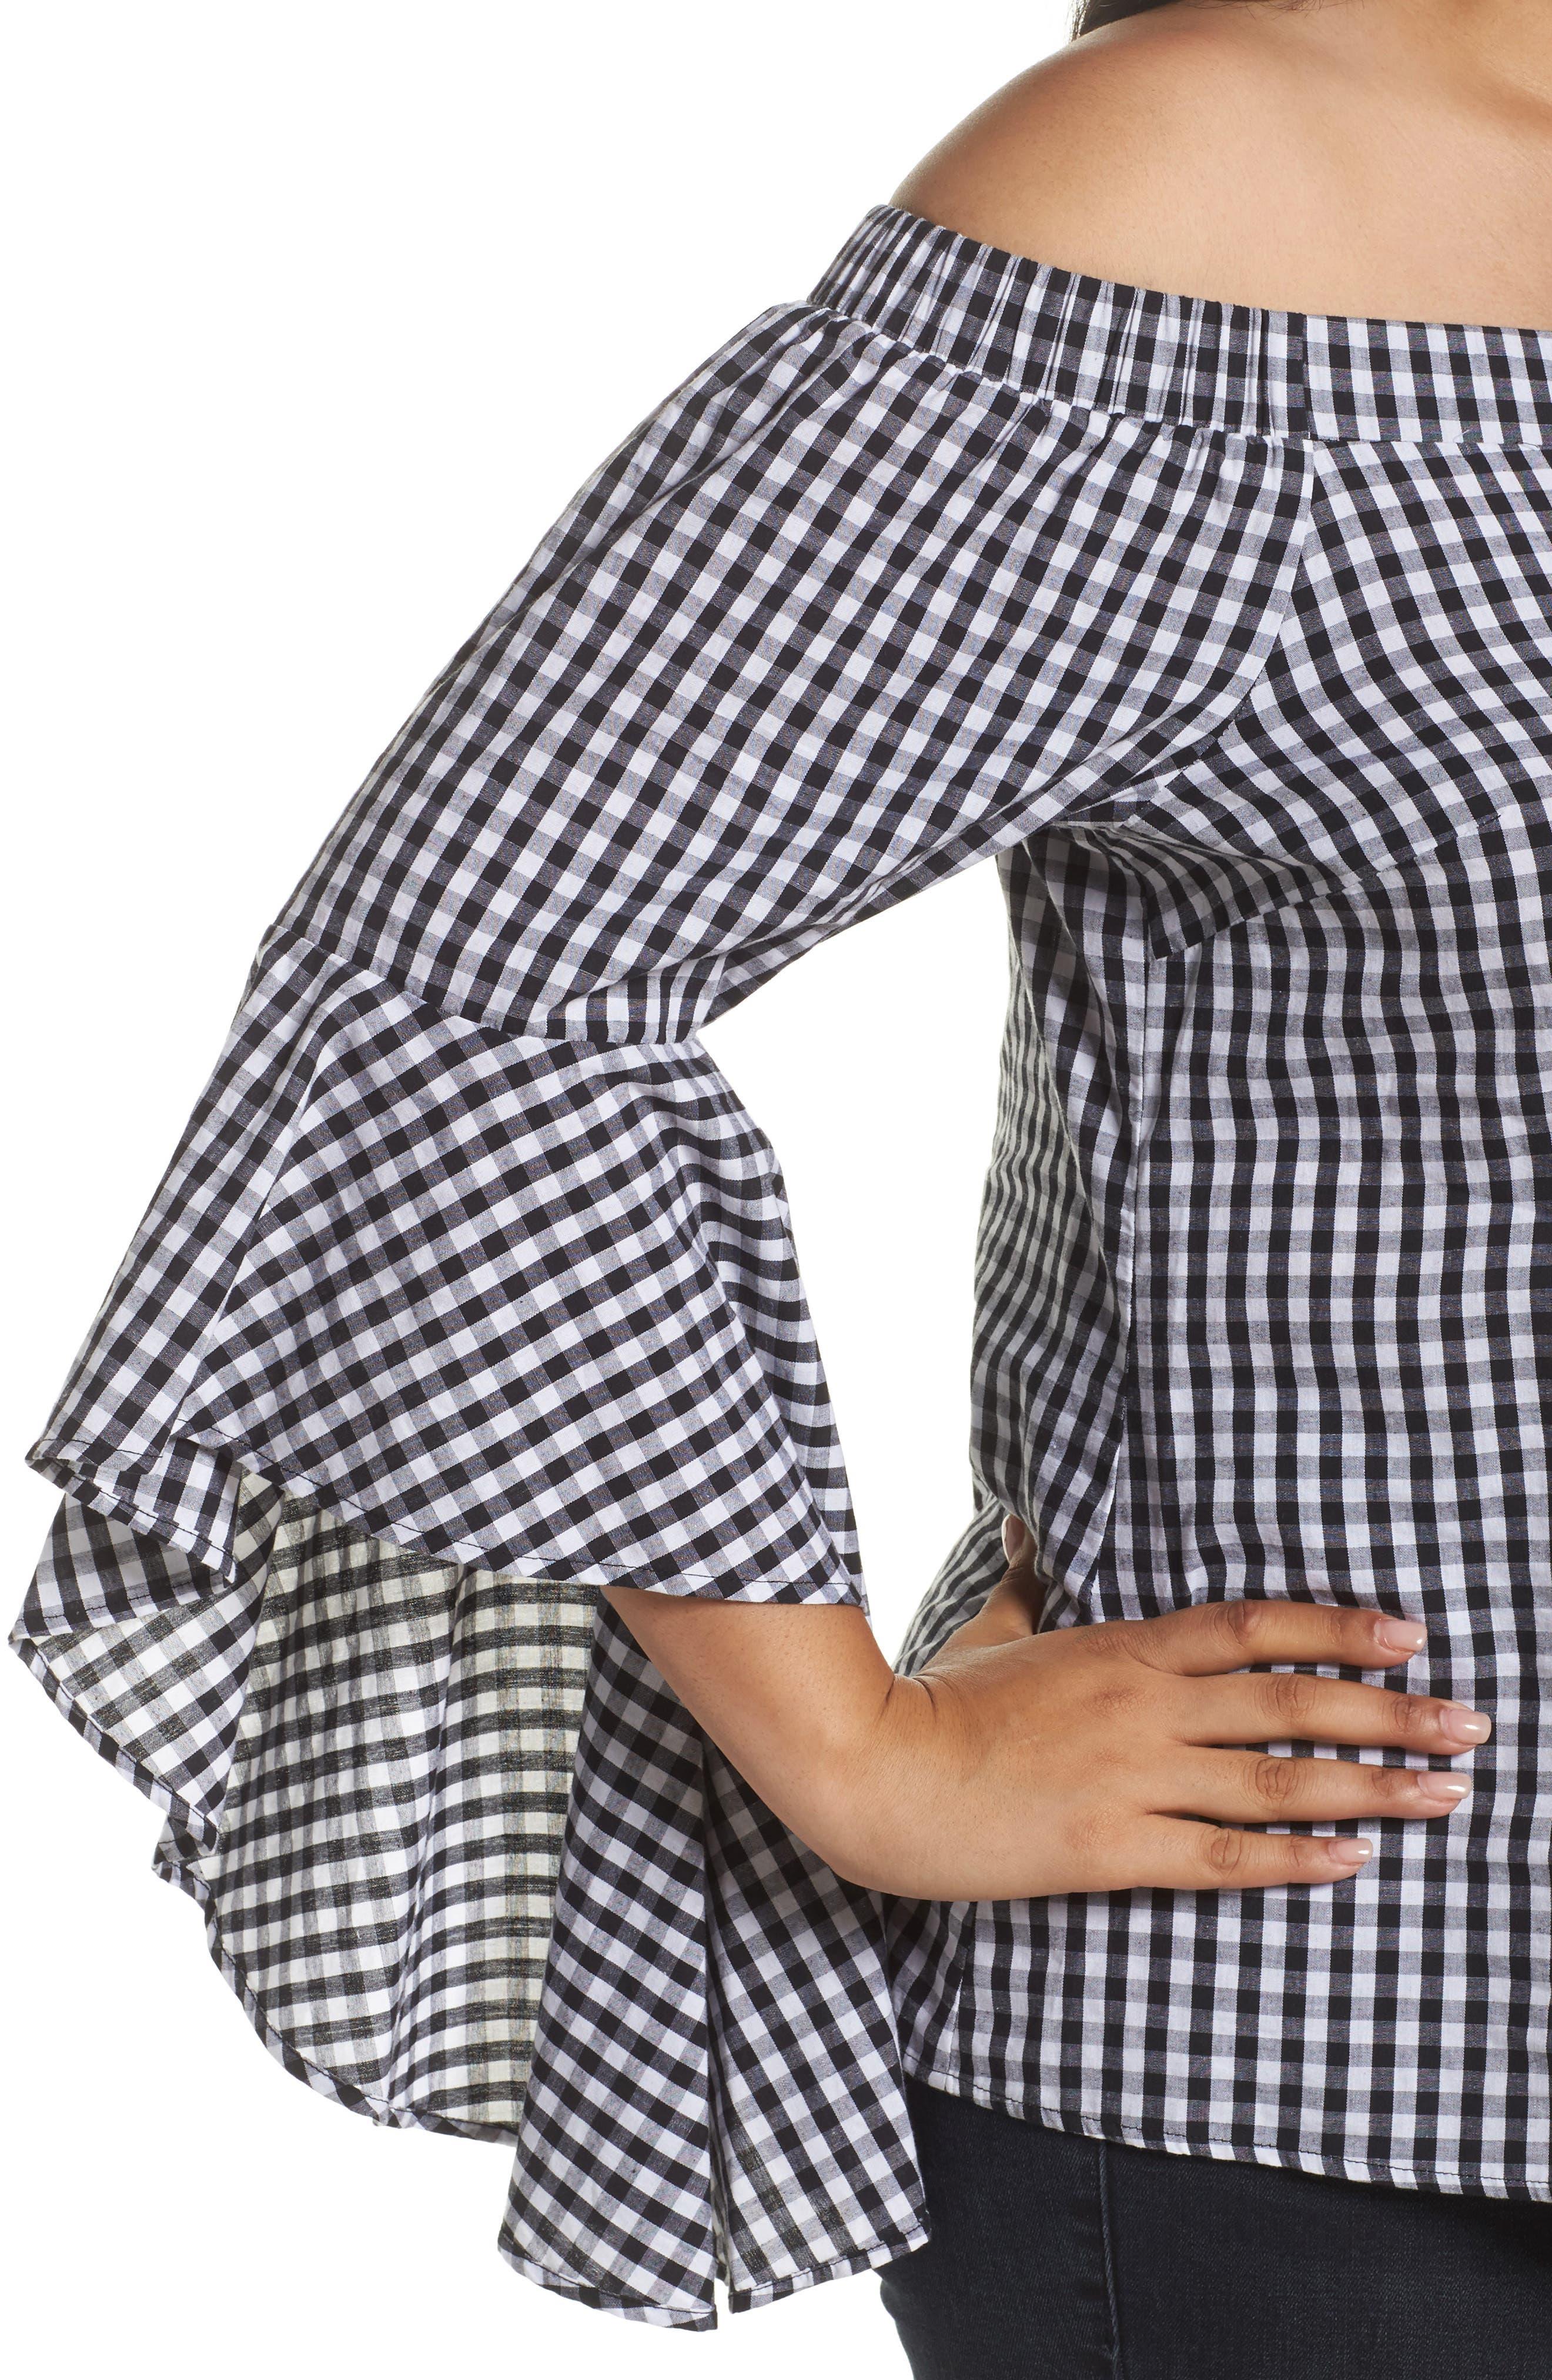 Bell Sleeve Off the Shoulder Shirt,                             Alternate thumbnail 5, color,                             Black / White